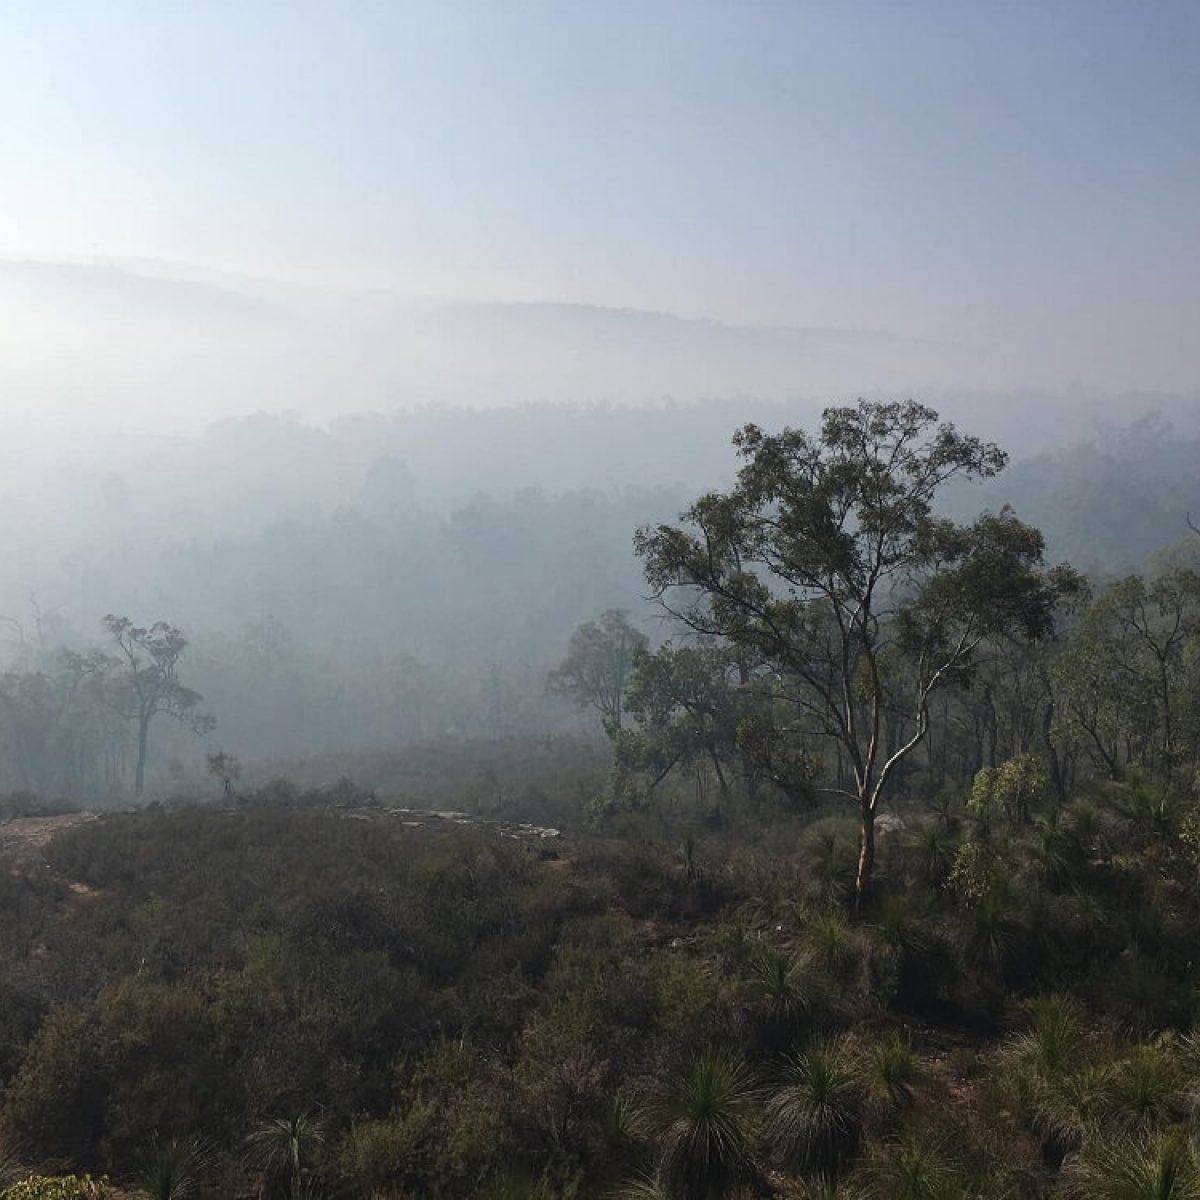 Mist over Darling Scarp Helena Valley Bibbulmun Track Western Australia